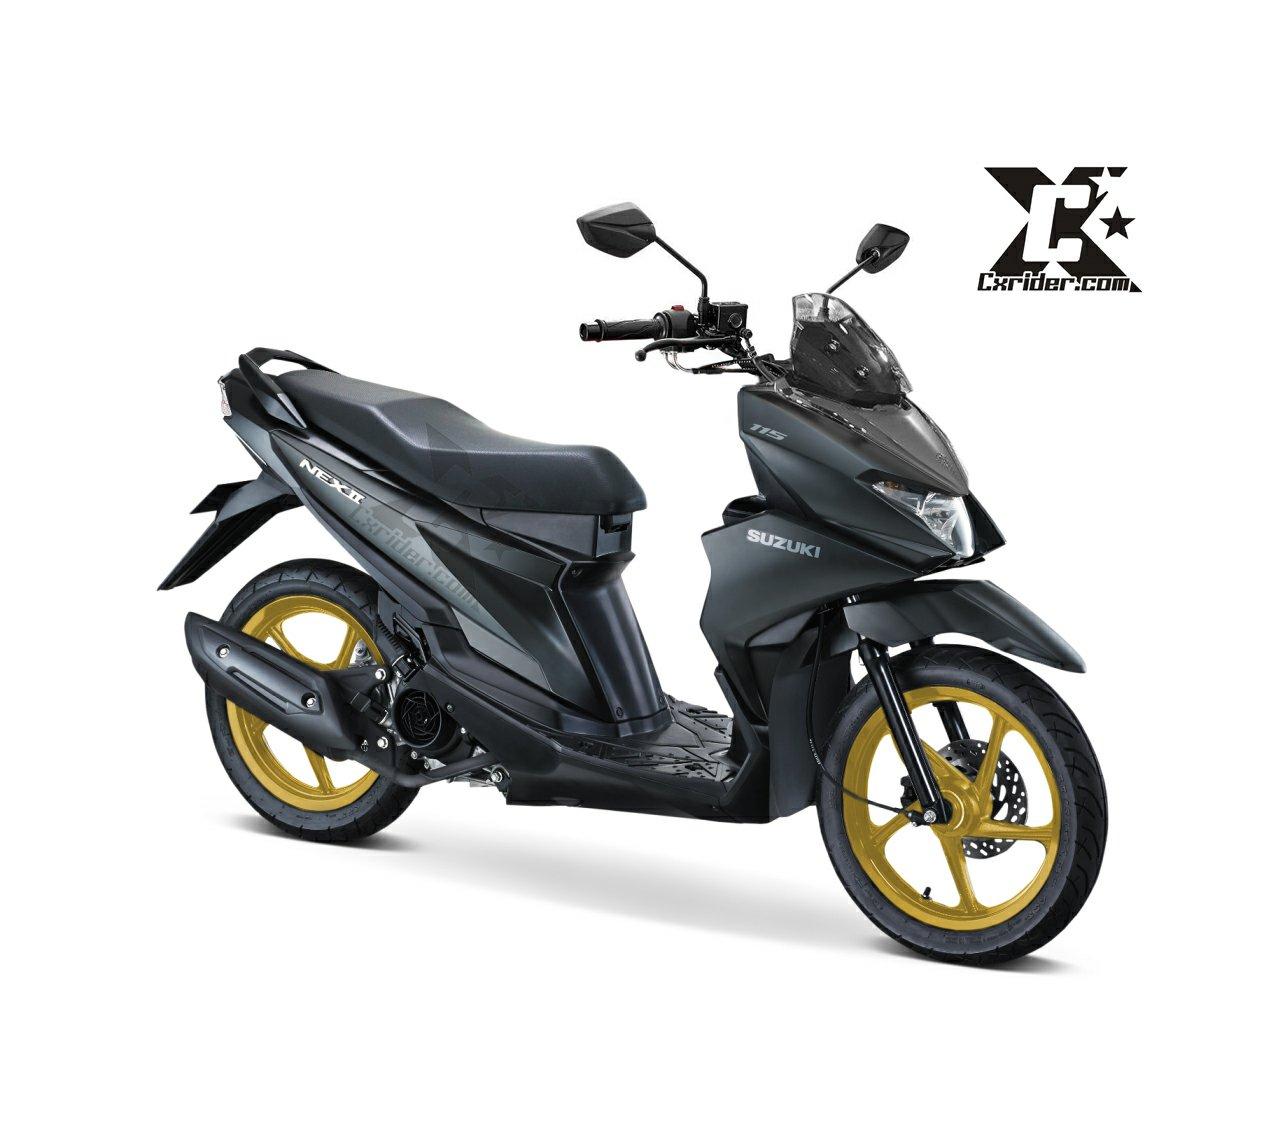 Modifikasi Suzuki Nex Ii Dengan Setang Trondol